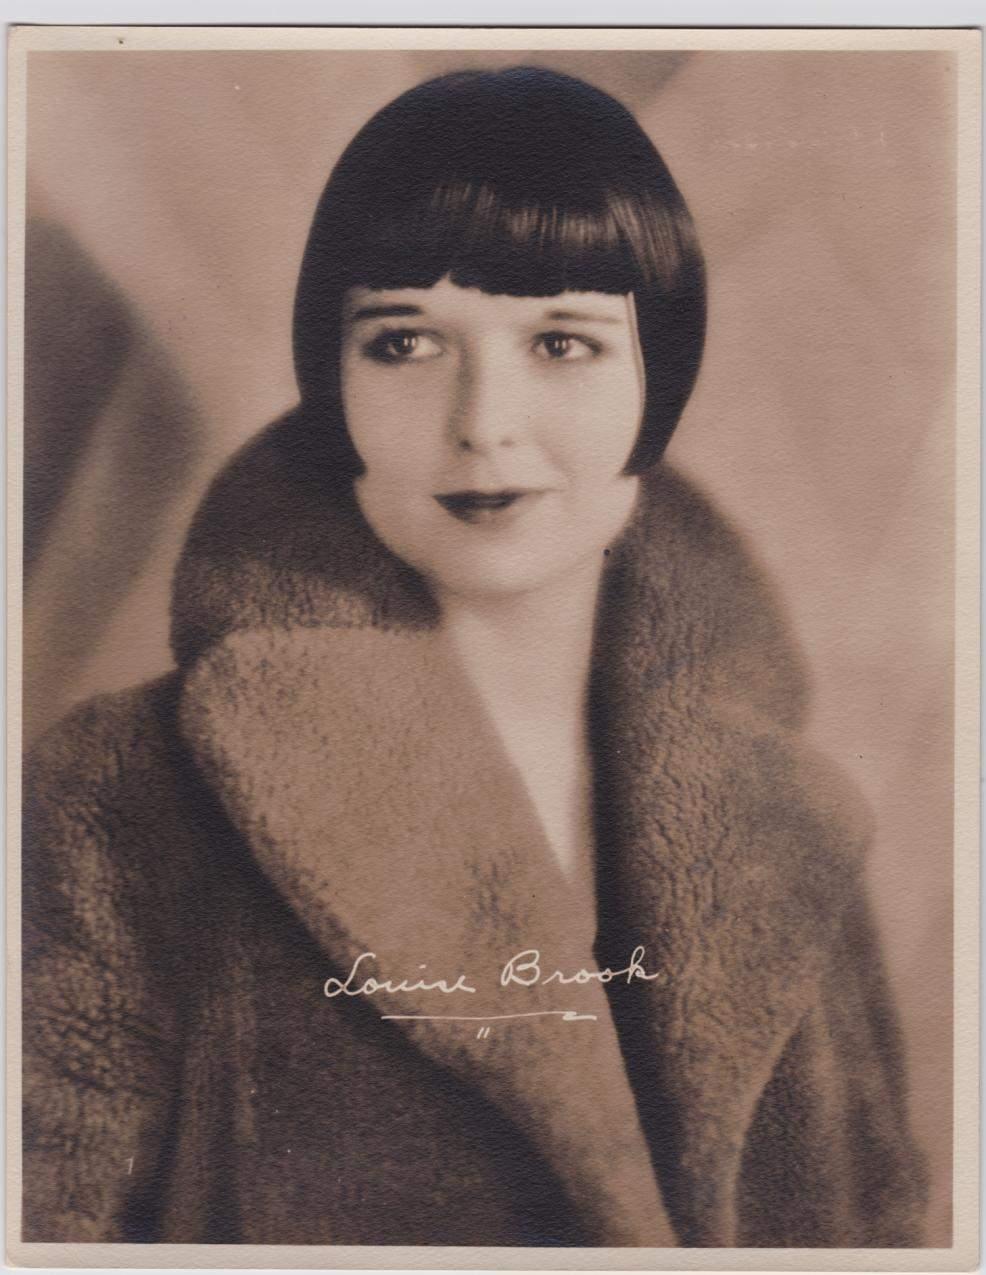 Louise Brooks Film Stars Portrait Co. Still